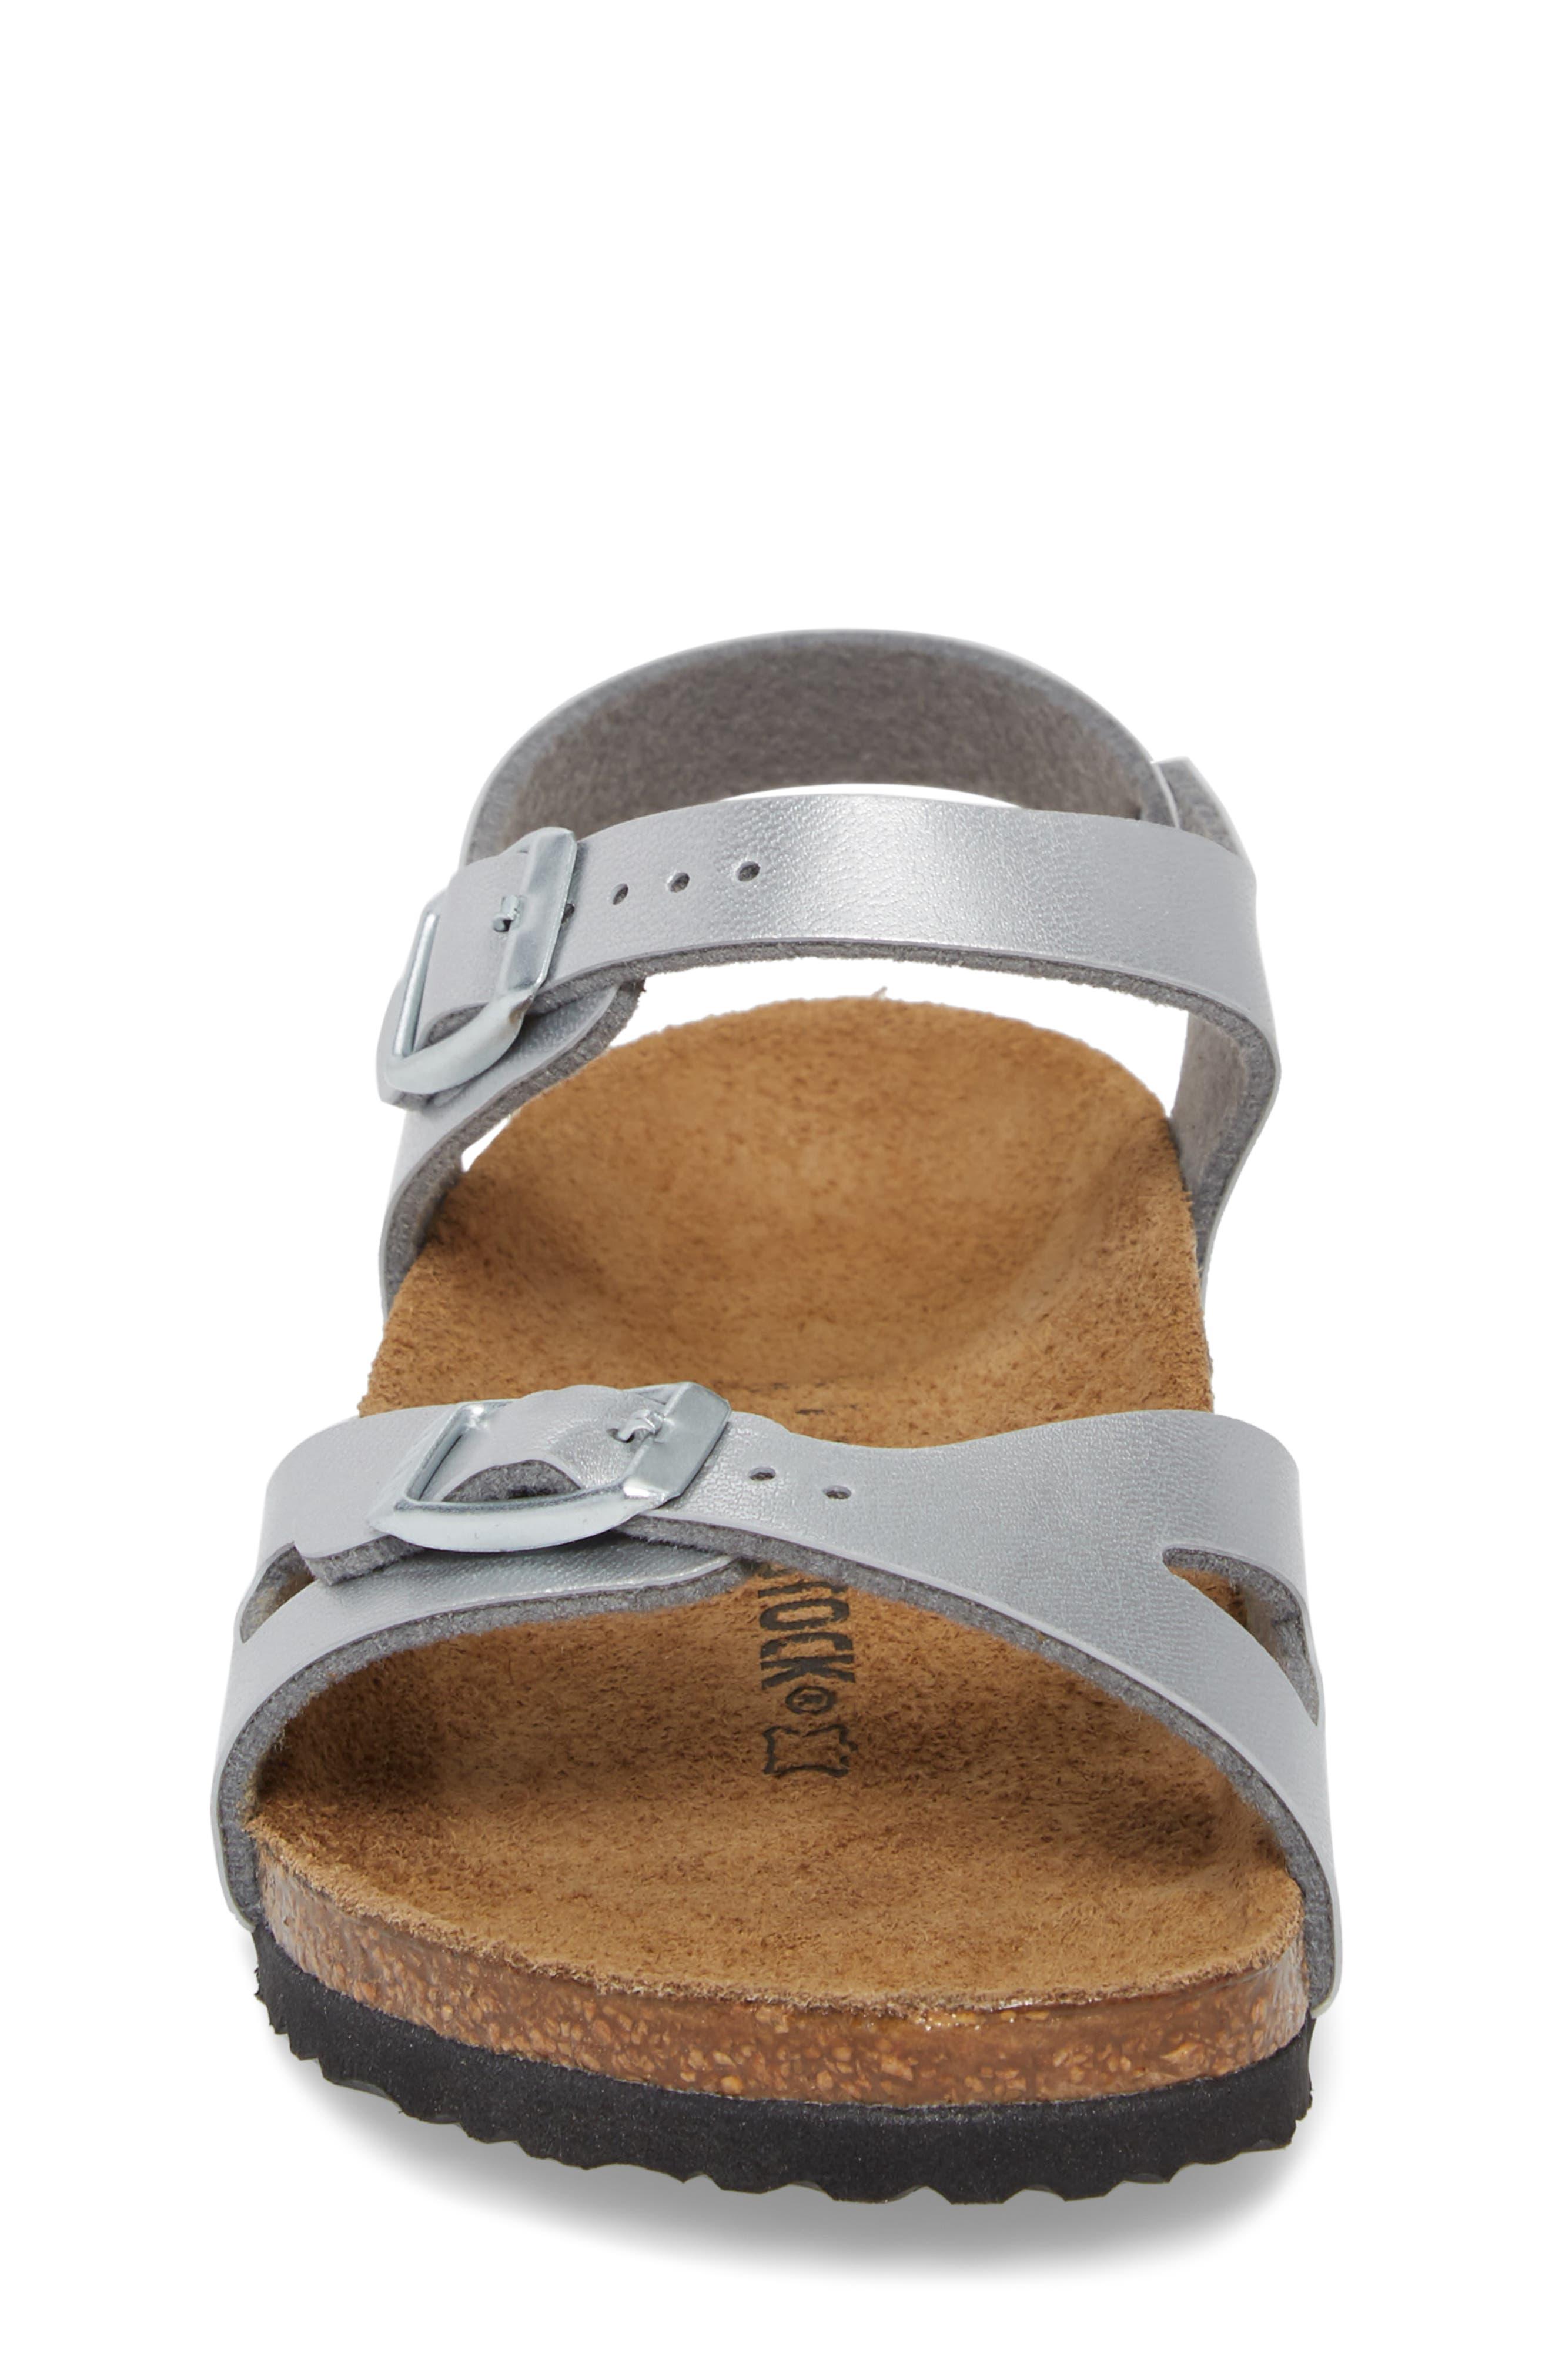 Rio Metallic Sandal,                             Alternate thumbnail 4, color,                             SILVER